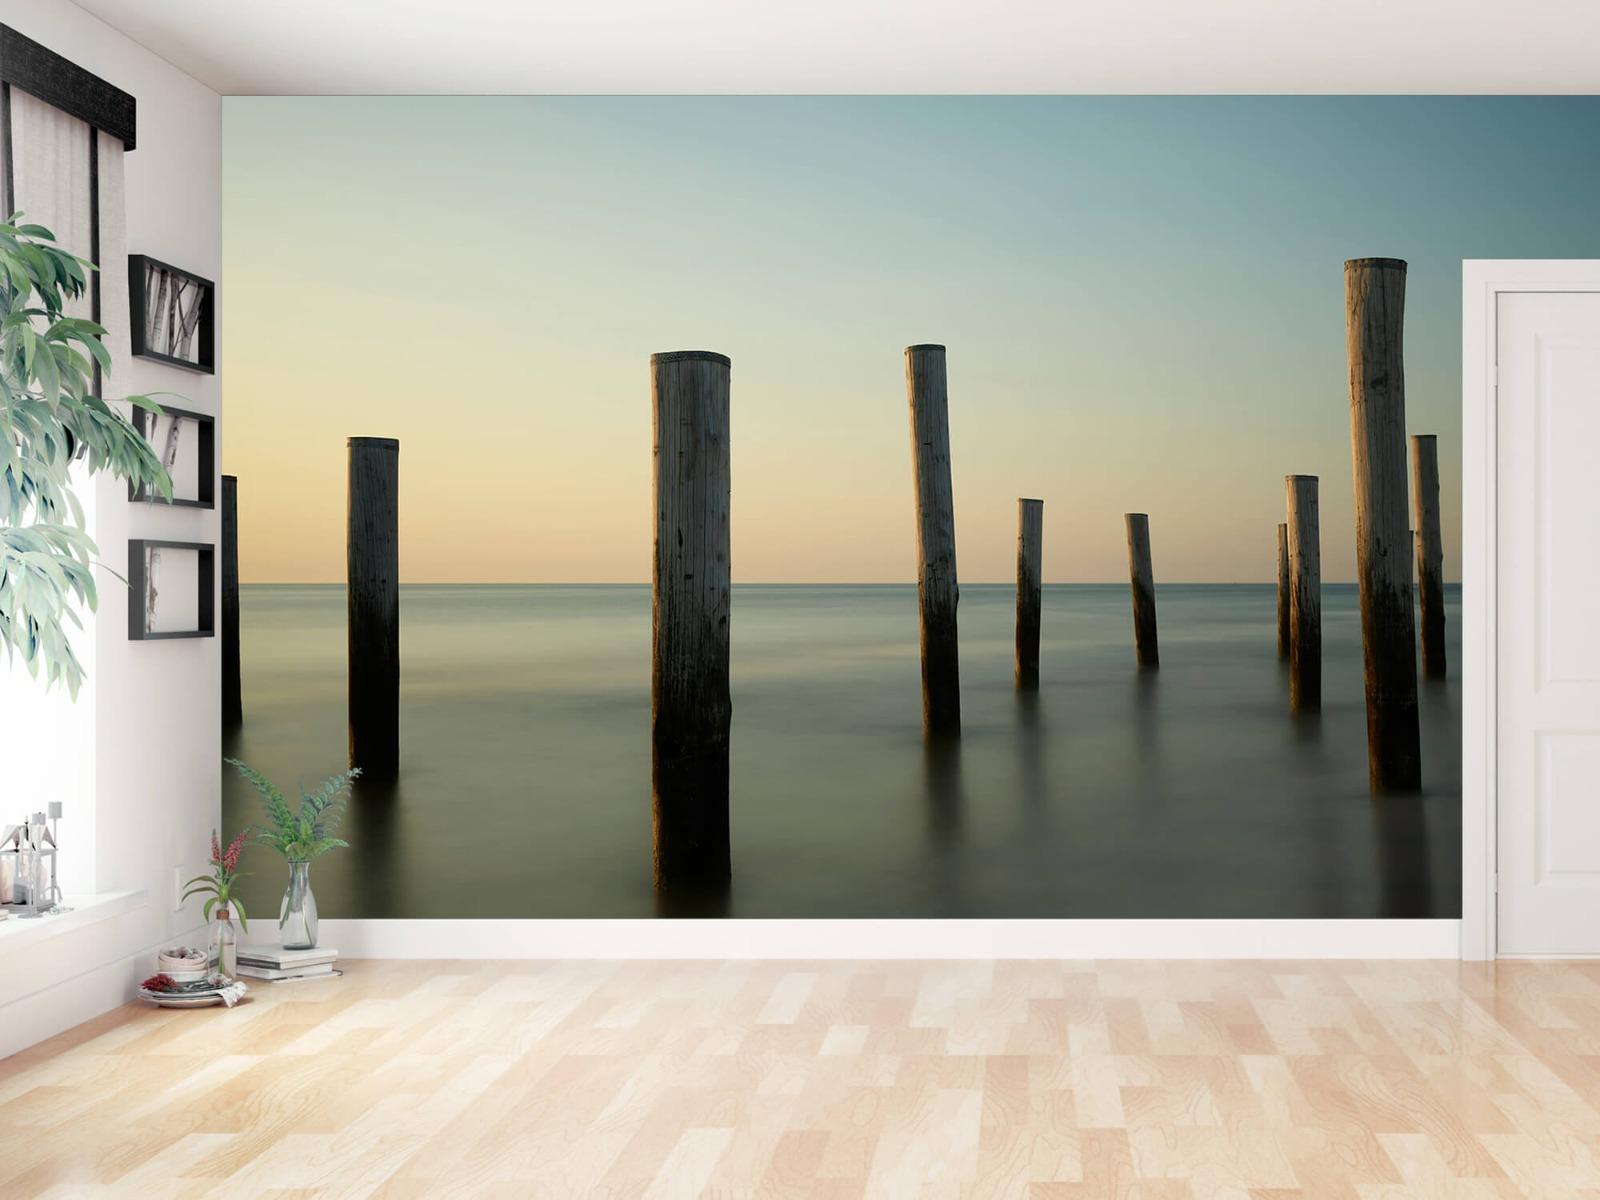 Zeeën en Oceanen - Houten strandpalen - Slaapkamer 14